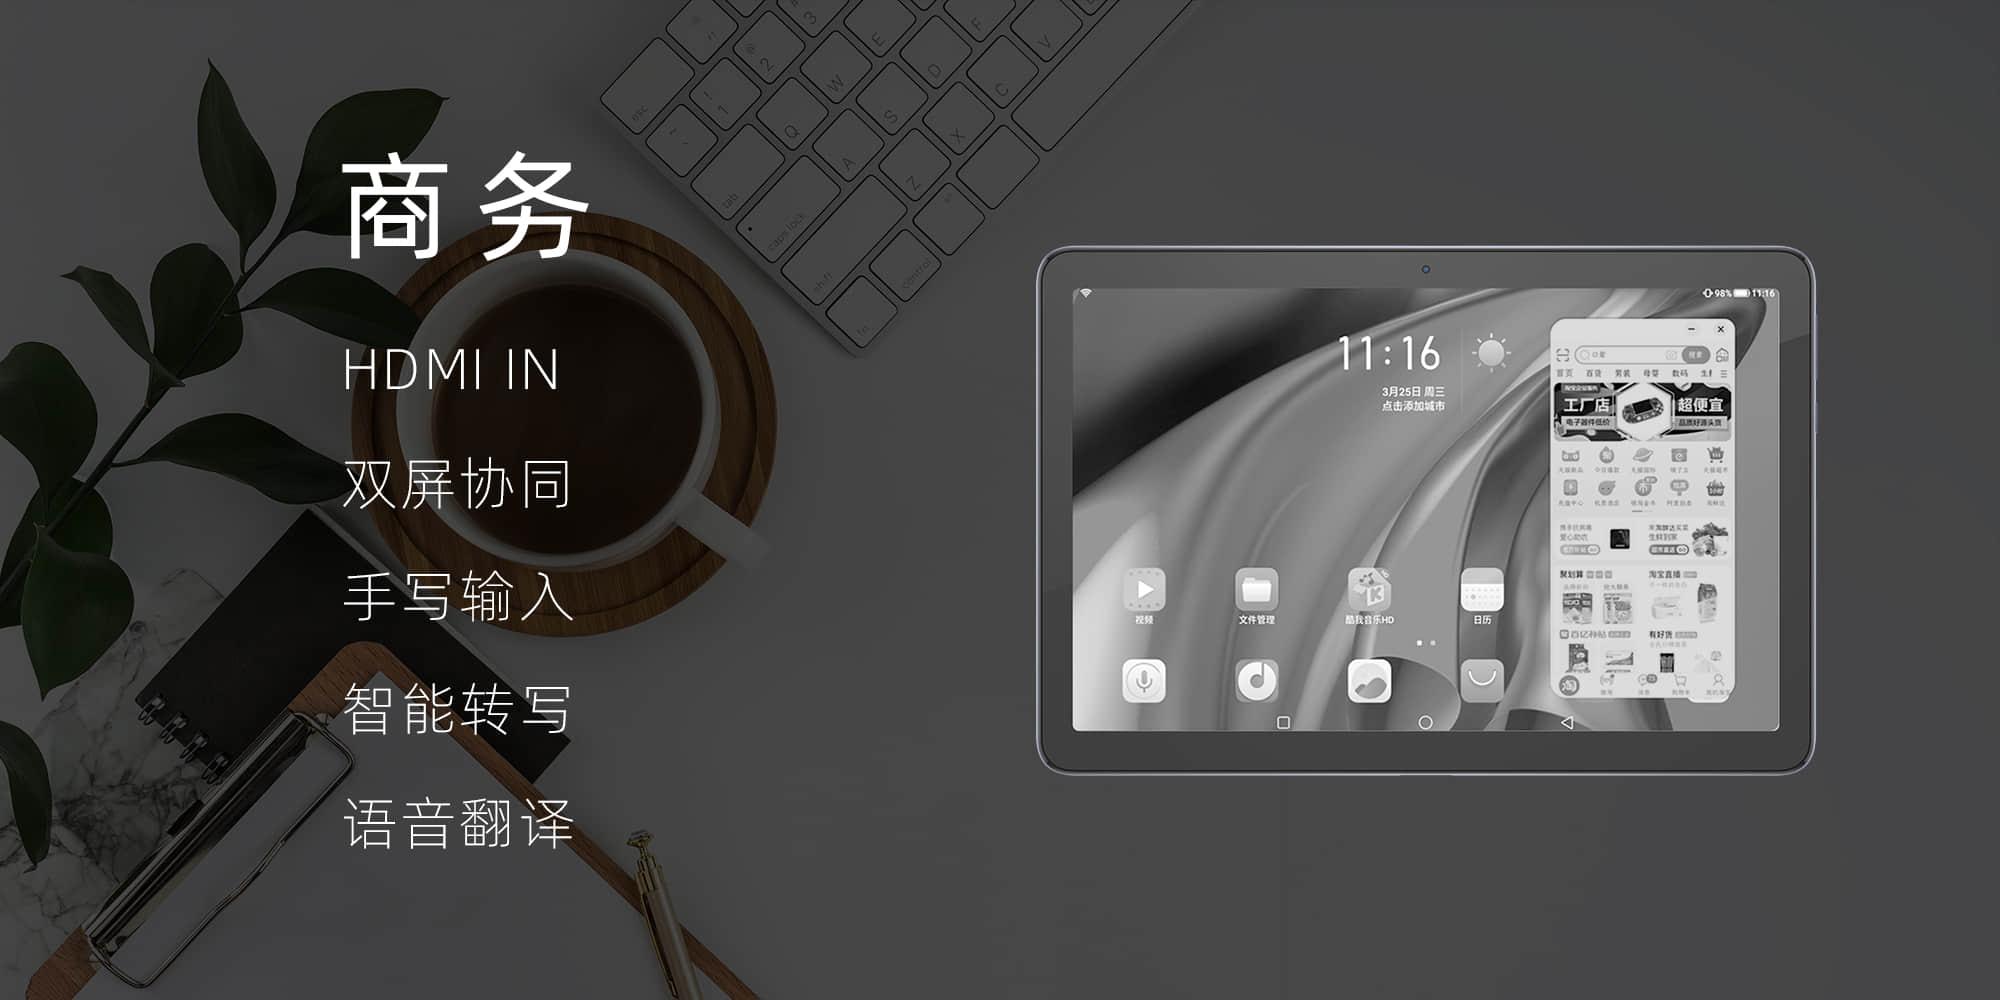 C:\Users\guojinhua1\Desktop\PPT-2\20.jpg20